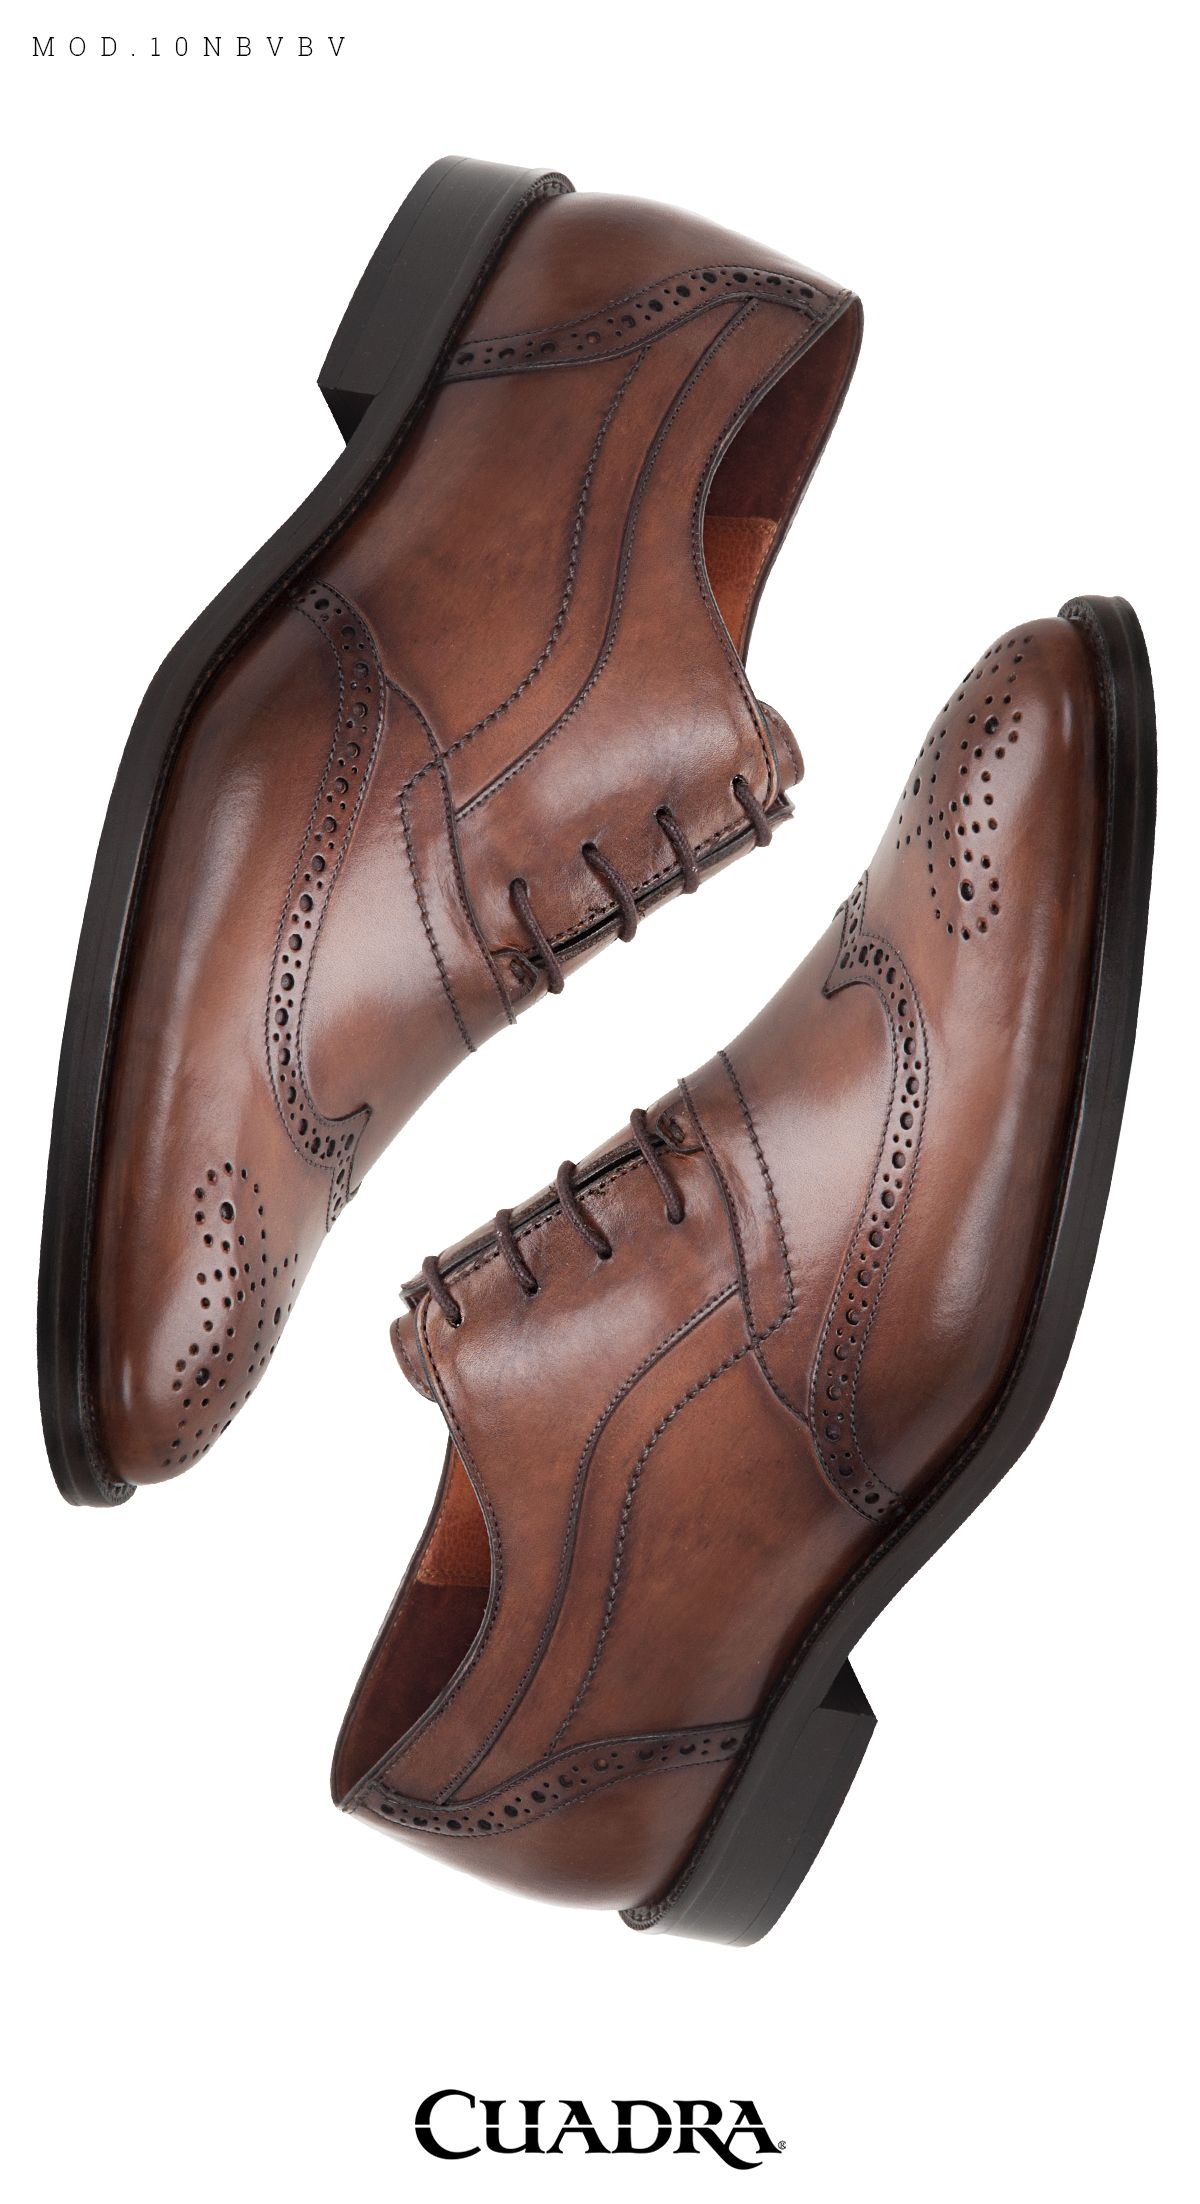 469a0efcfba Zapatos de Moda 2018 Hombre Franco Cuadra.  zapatosdehombre  calzadohombre   zapatoshombrevestir  zapatosdepiel  mocasineshombre